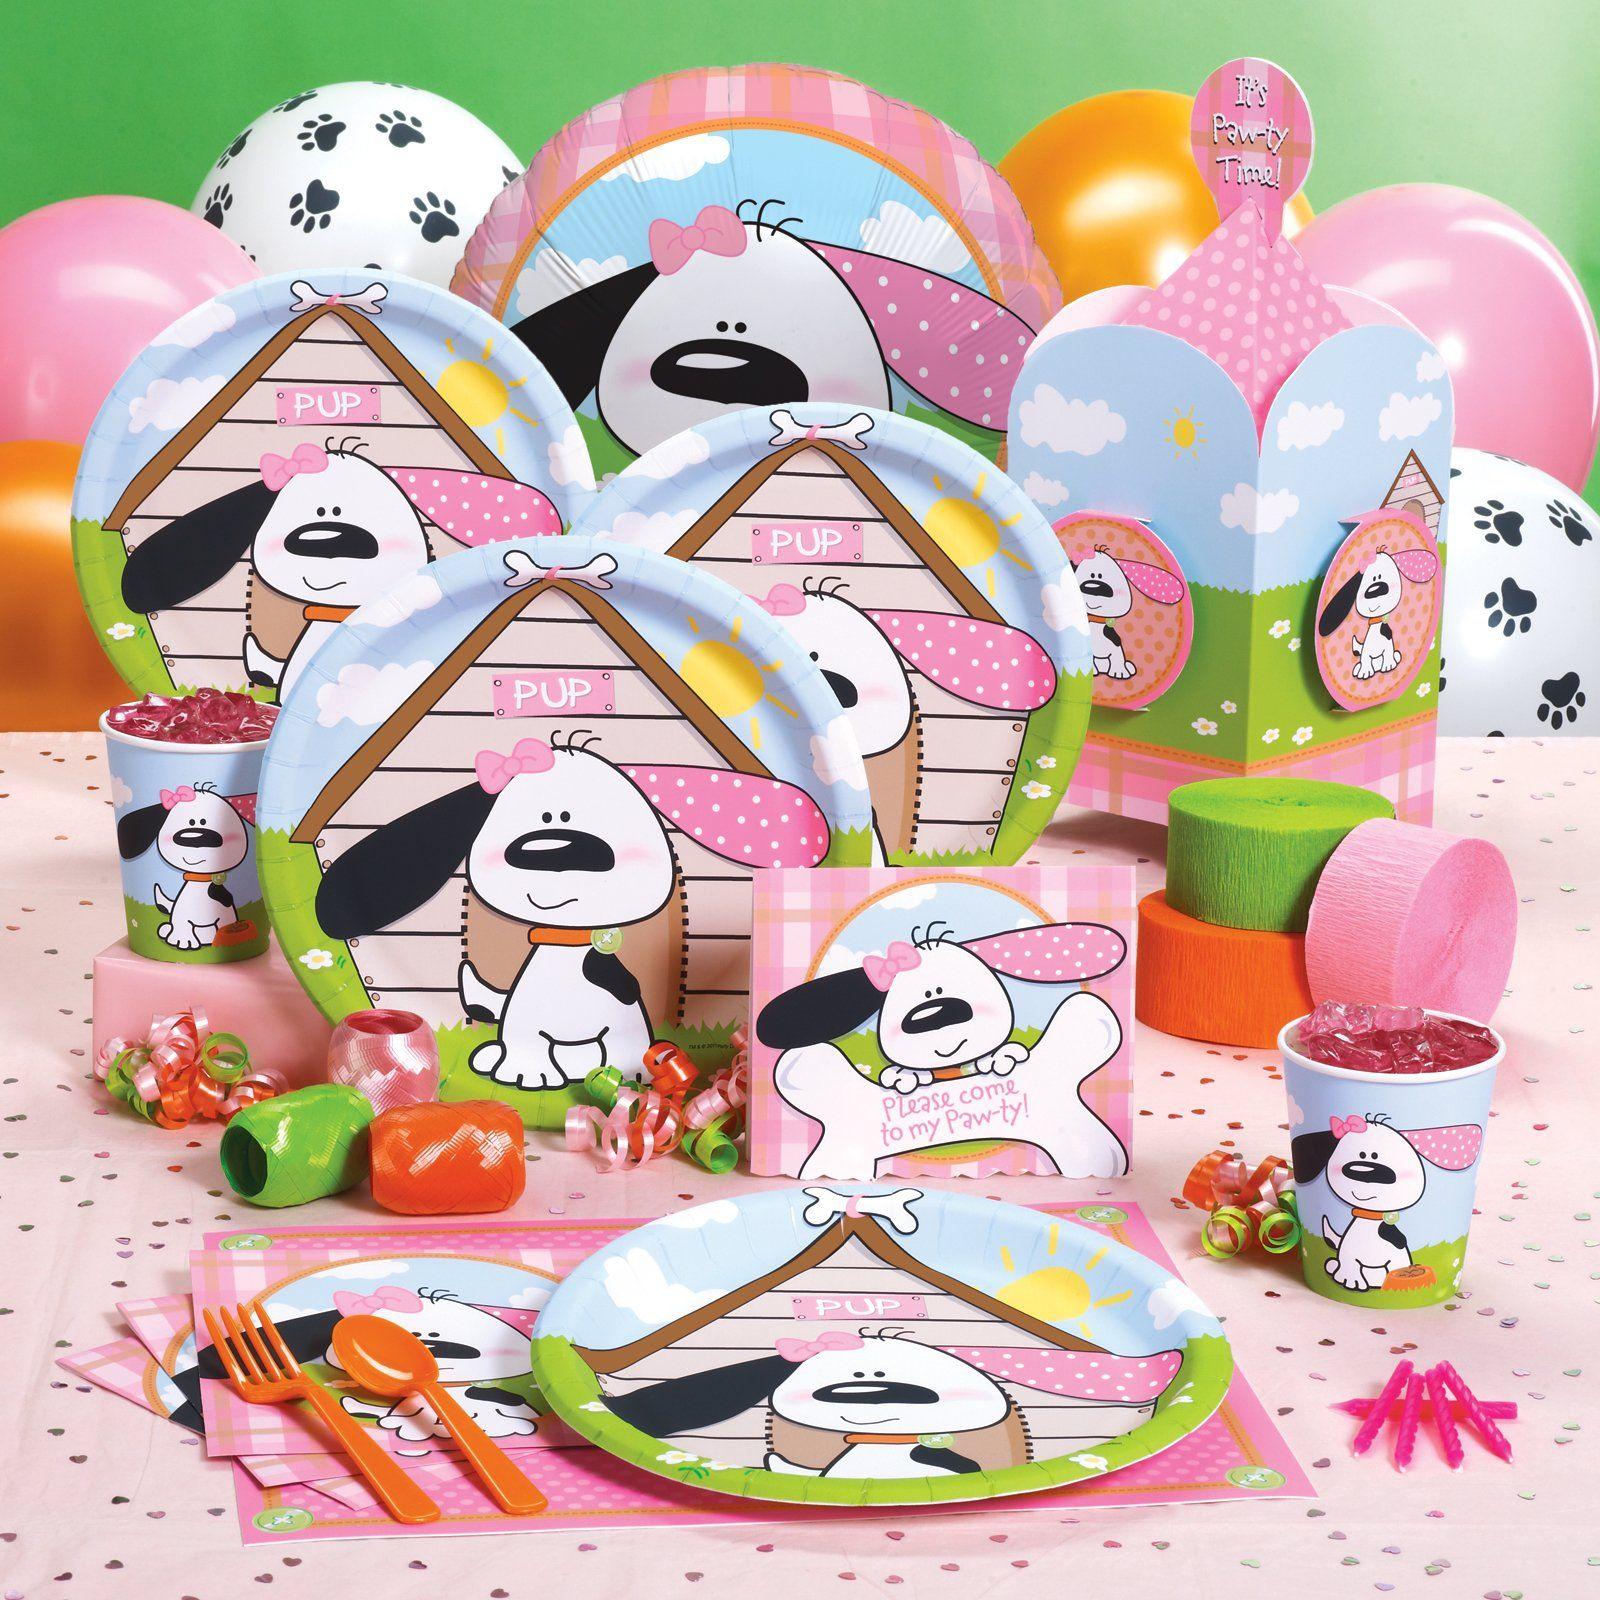 Playful Puppy Pink Party Supplies Birthdayexpress Com Dog Birthday Party Puppy Party Birthday Party Supplies